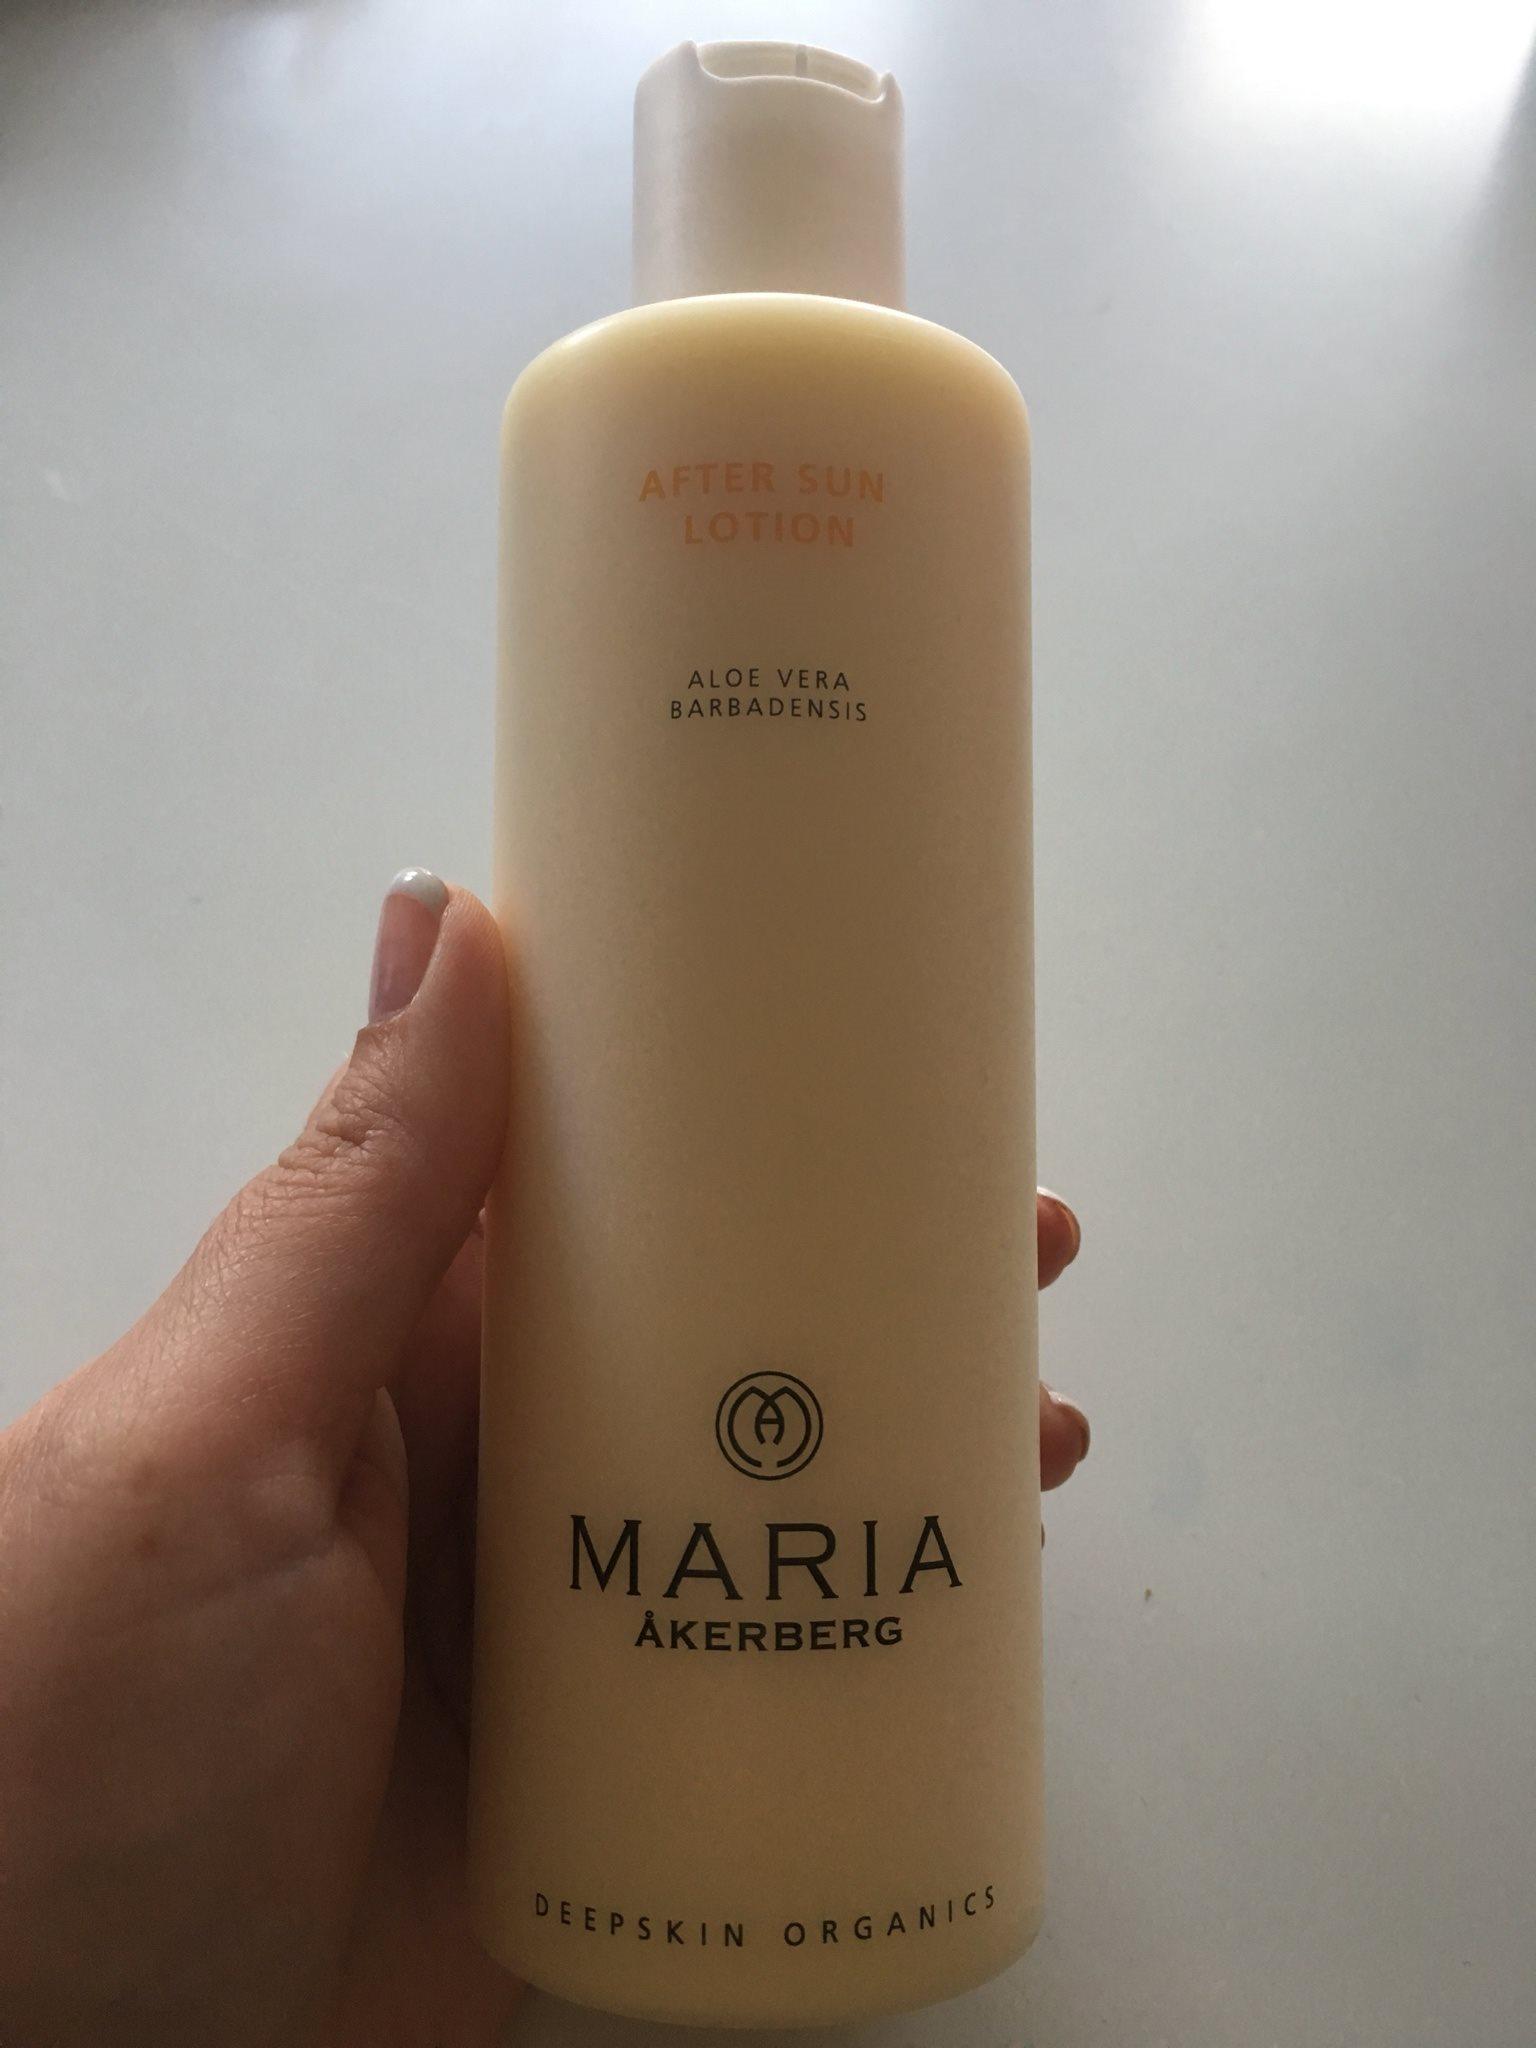 maria åkerberg after sun